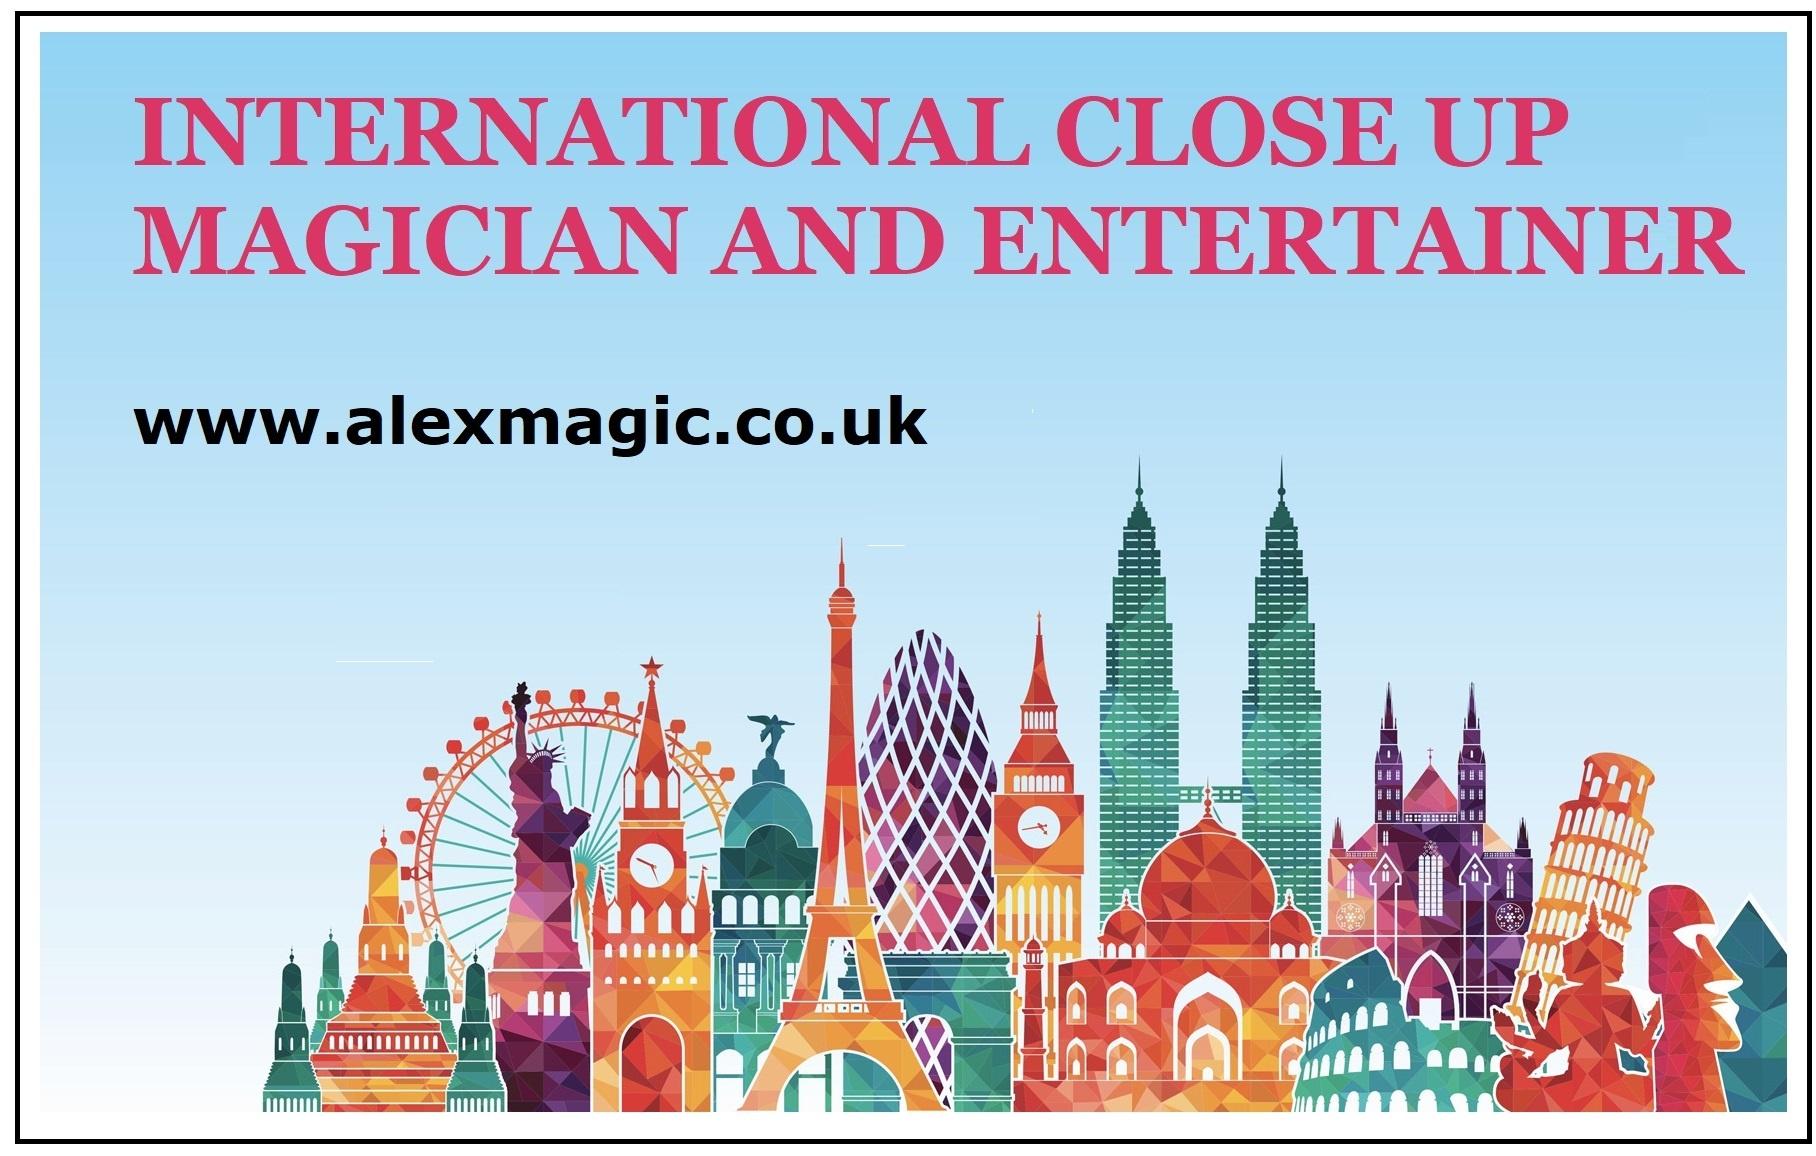 Global International Magician